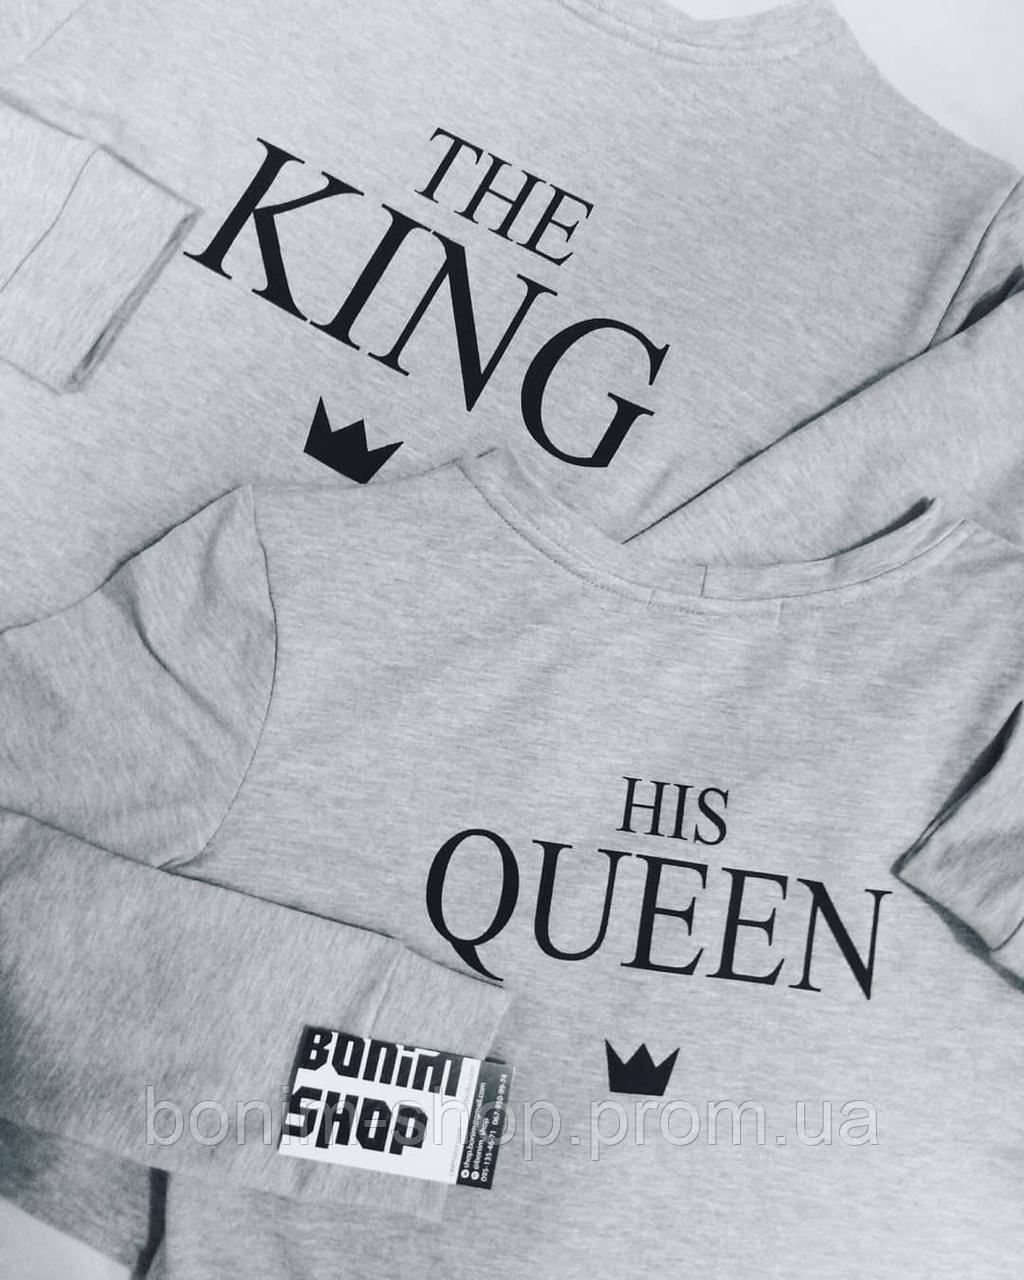 Серые парные свитшоты The King и His queen